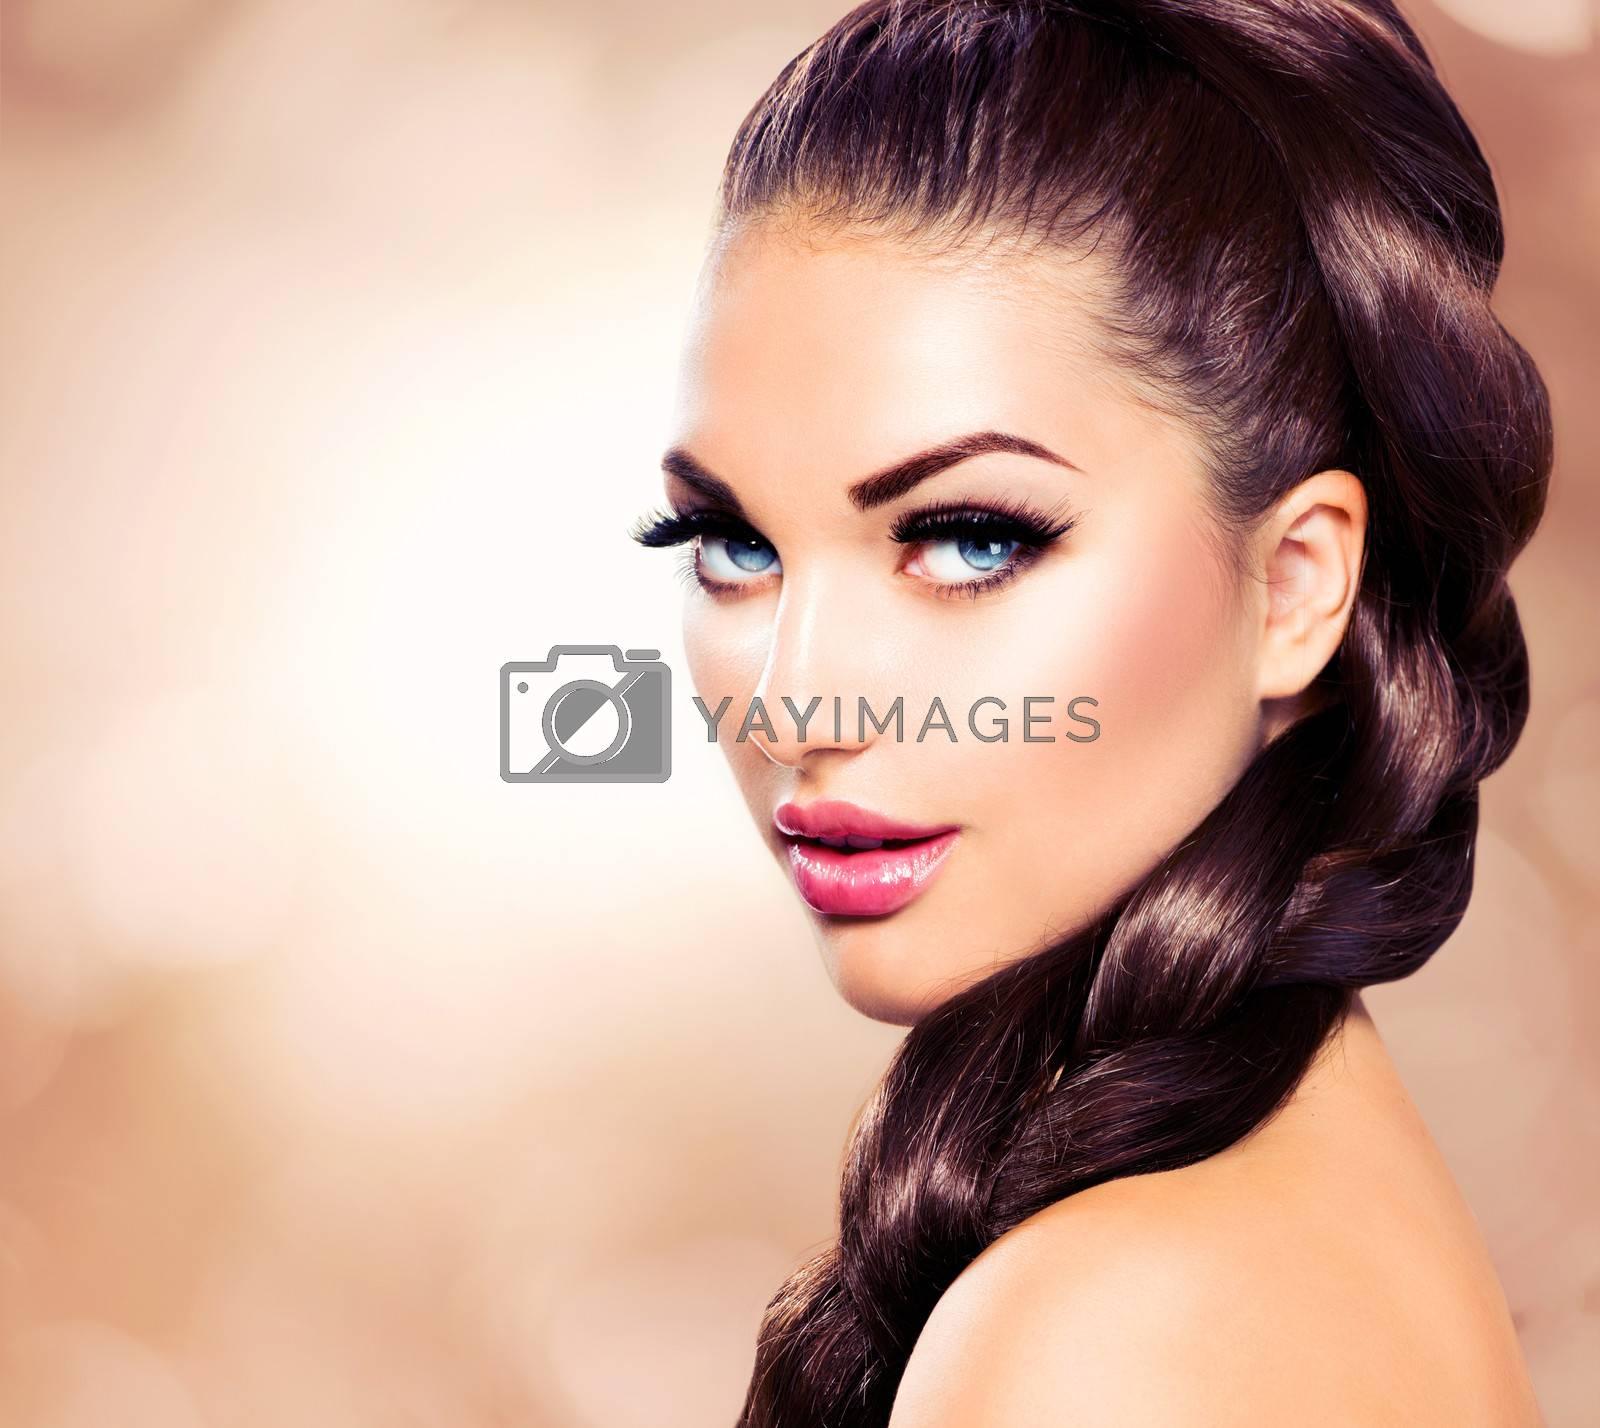 Hair Braid. Beautiful Woman with Healthy Long Brown Hair